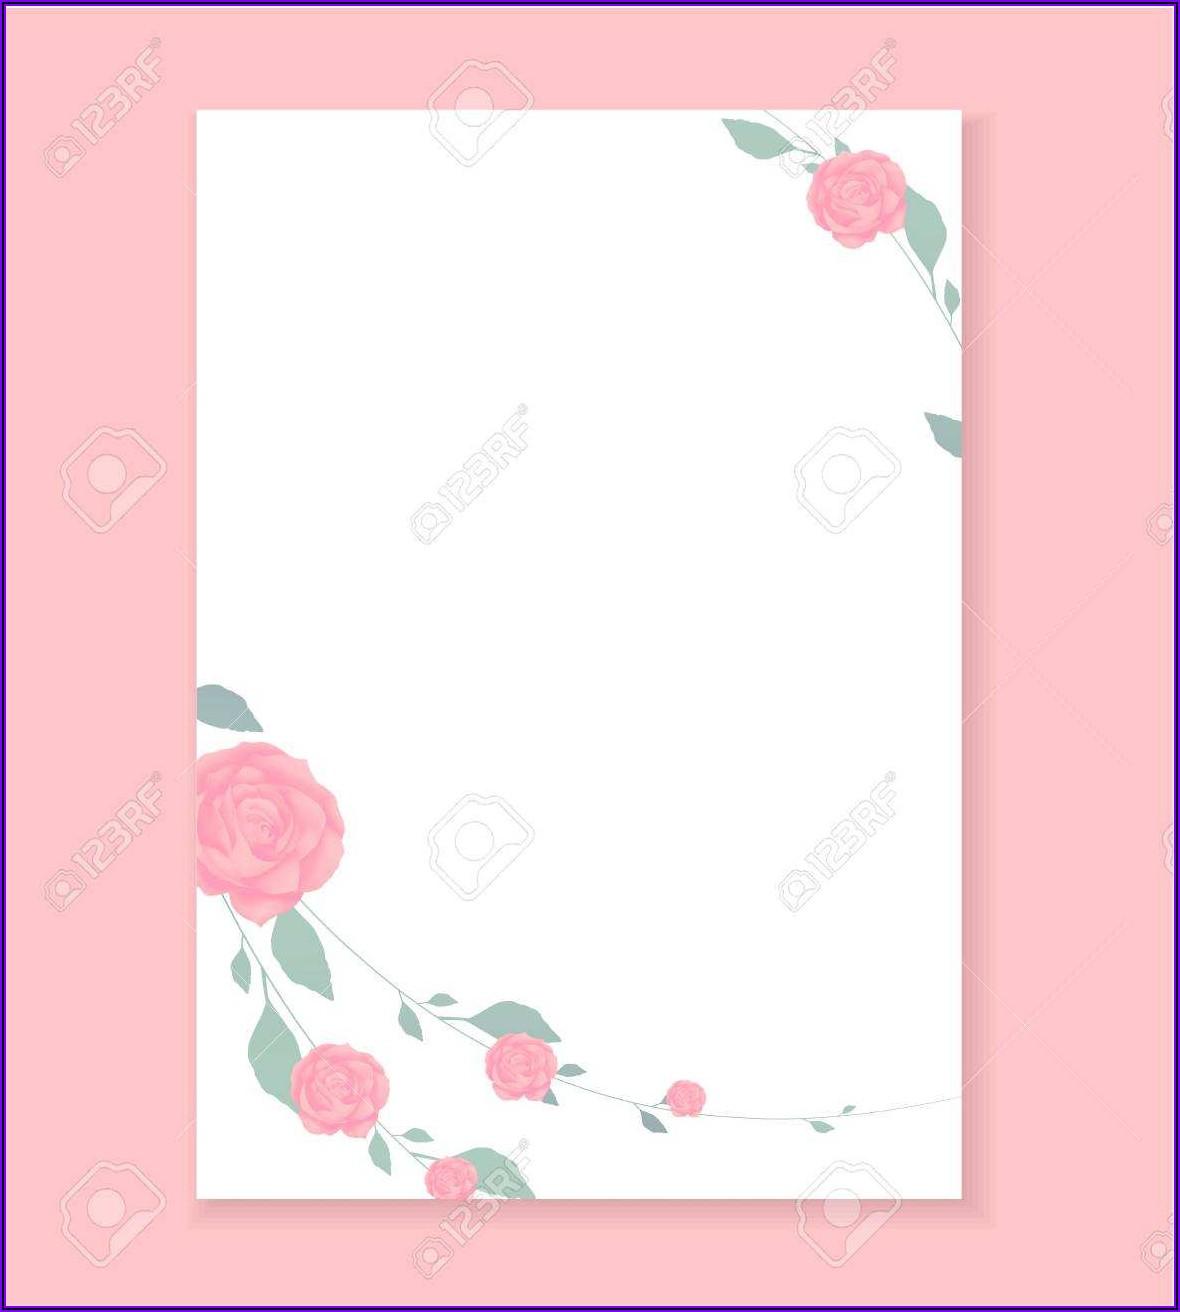 Floral Wedding Invitation Blank Template